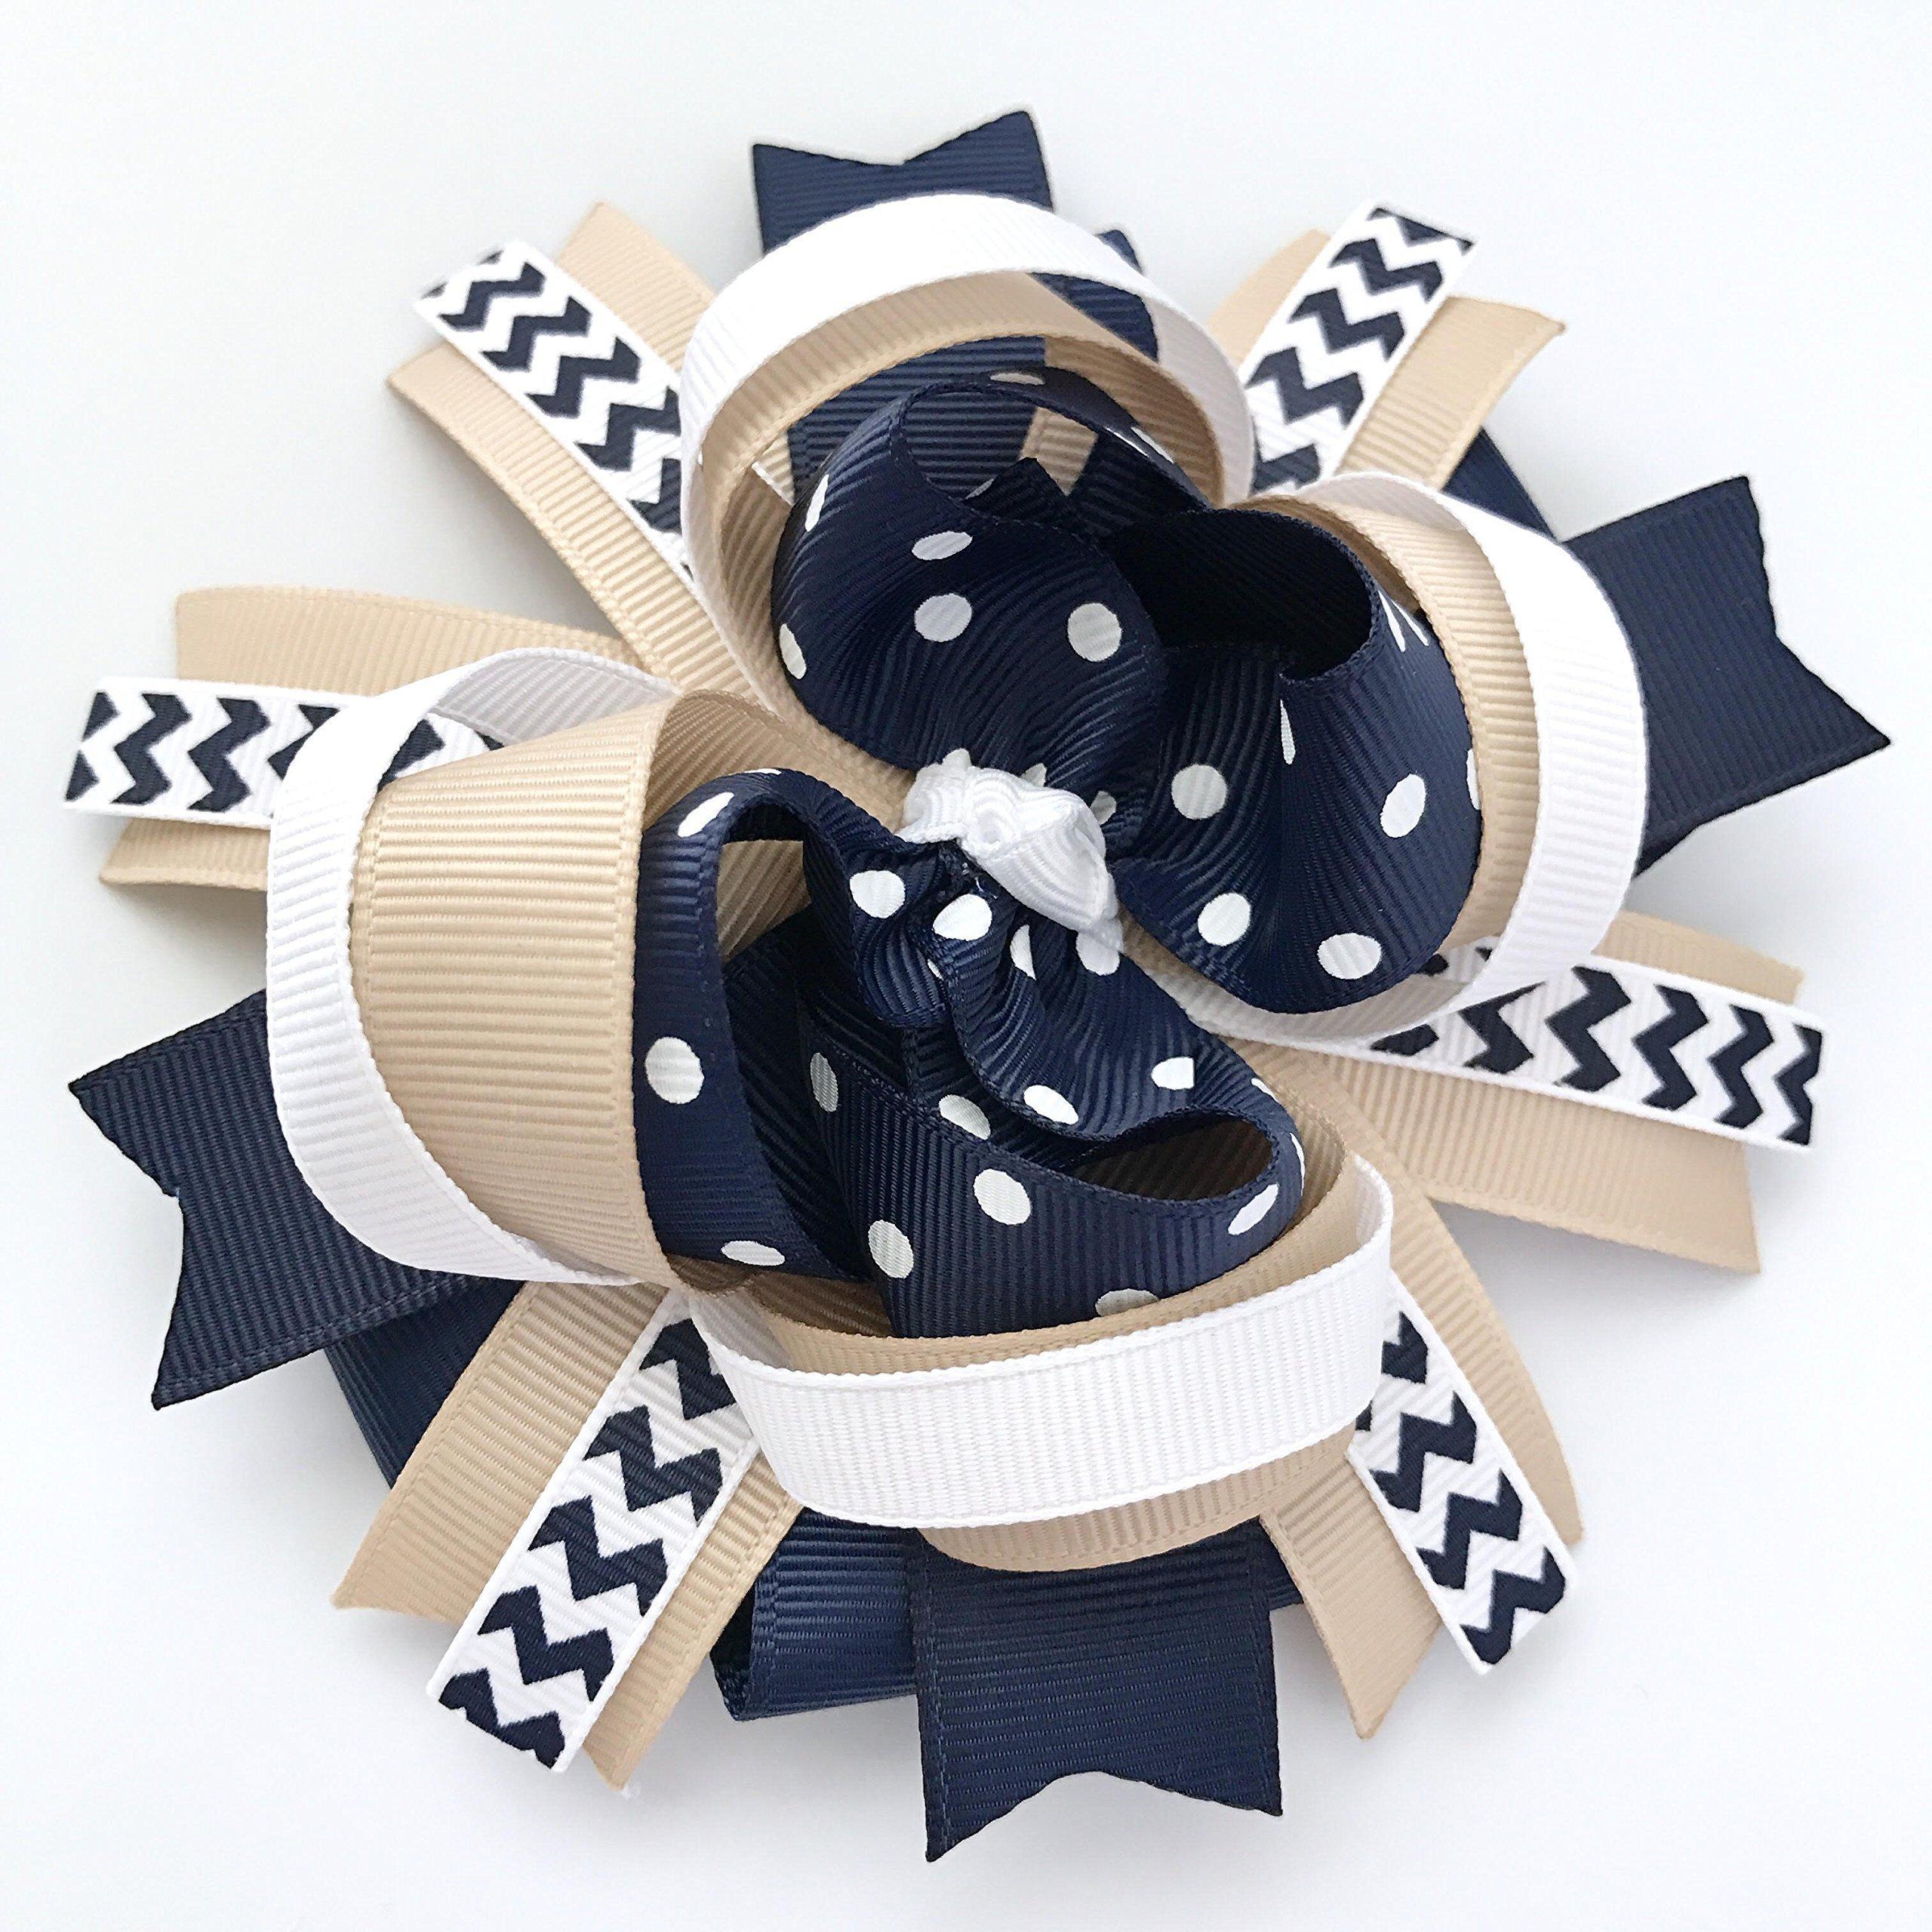 School Uniform Khaki Tan Navy White Hair Bow, Handmade School Uniform Navy Khaki Tan White Hair Bow